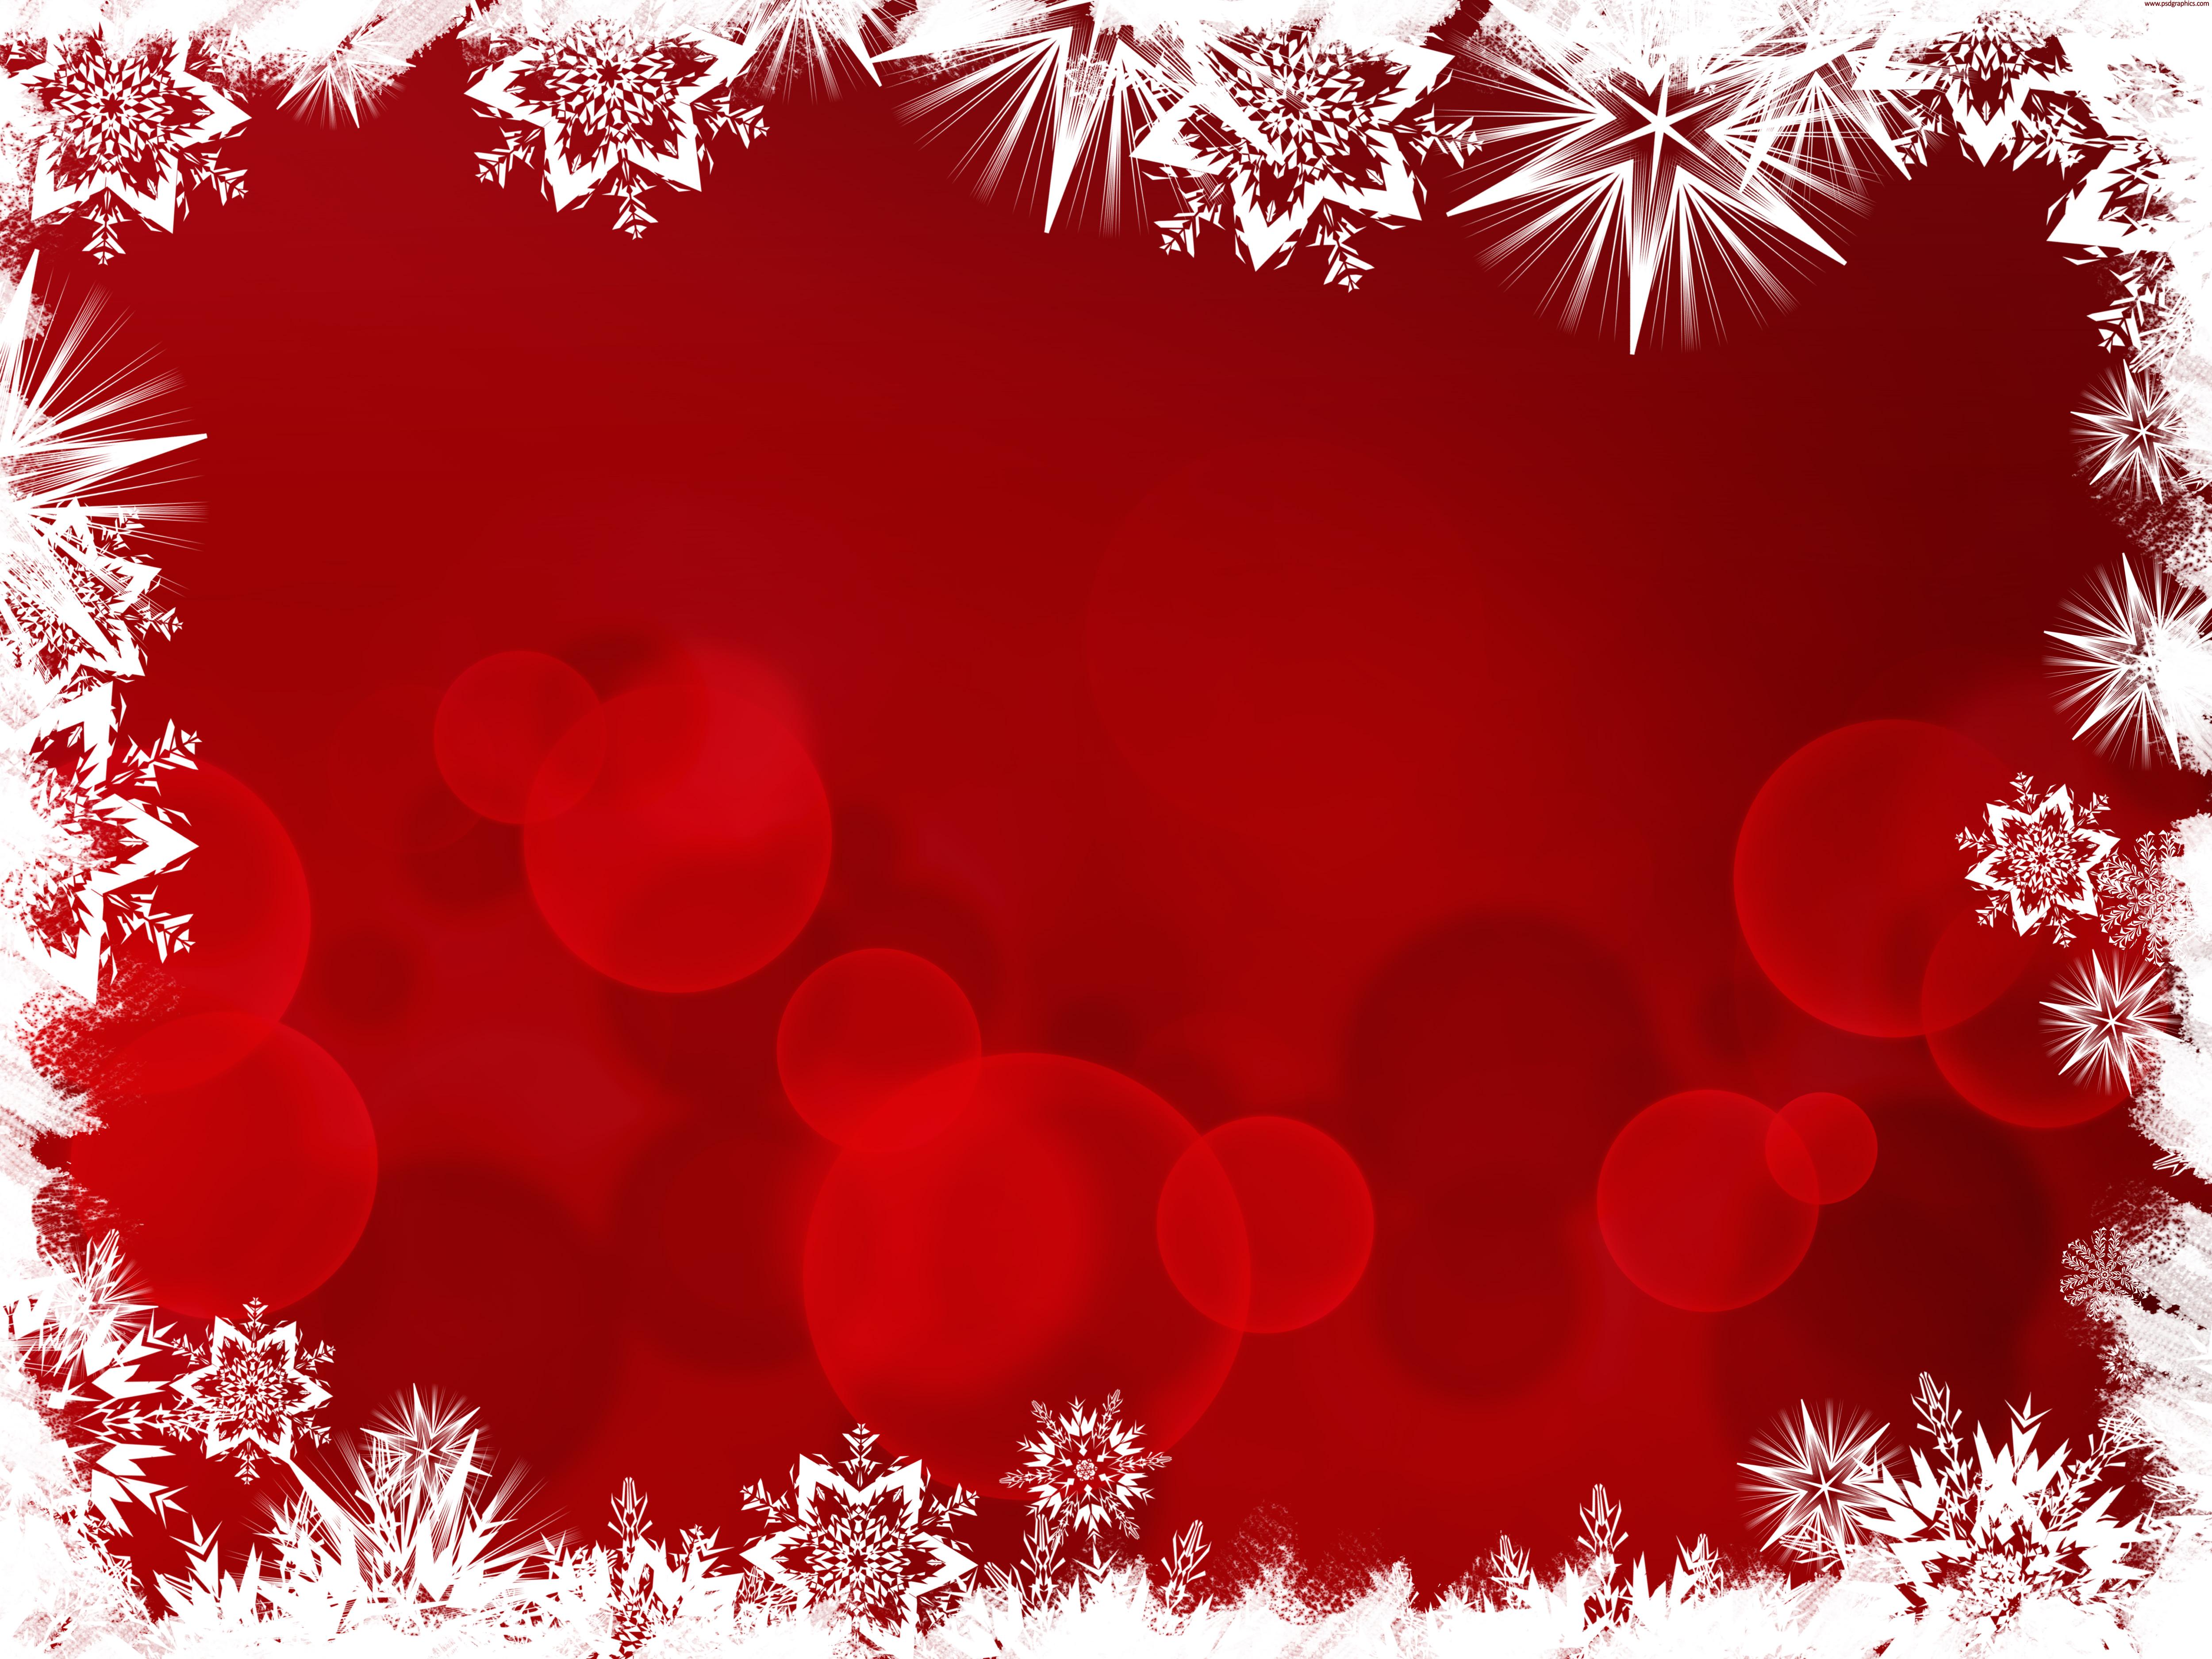 Blank Christmas background 5000x3750